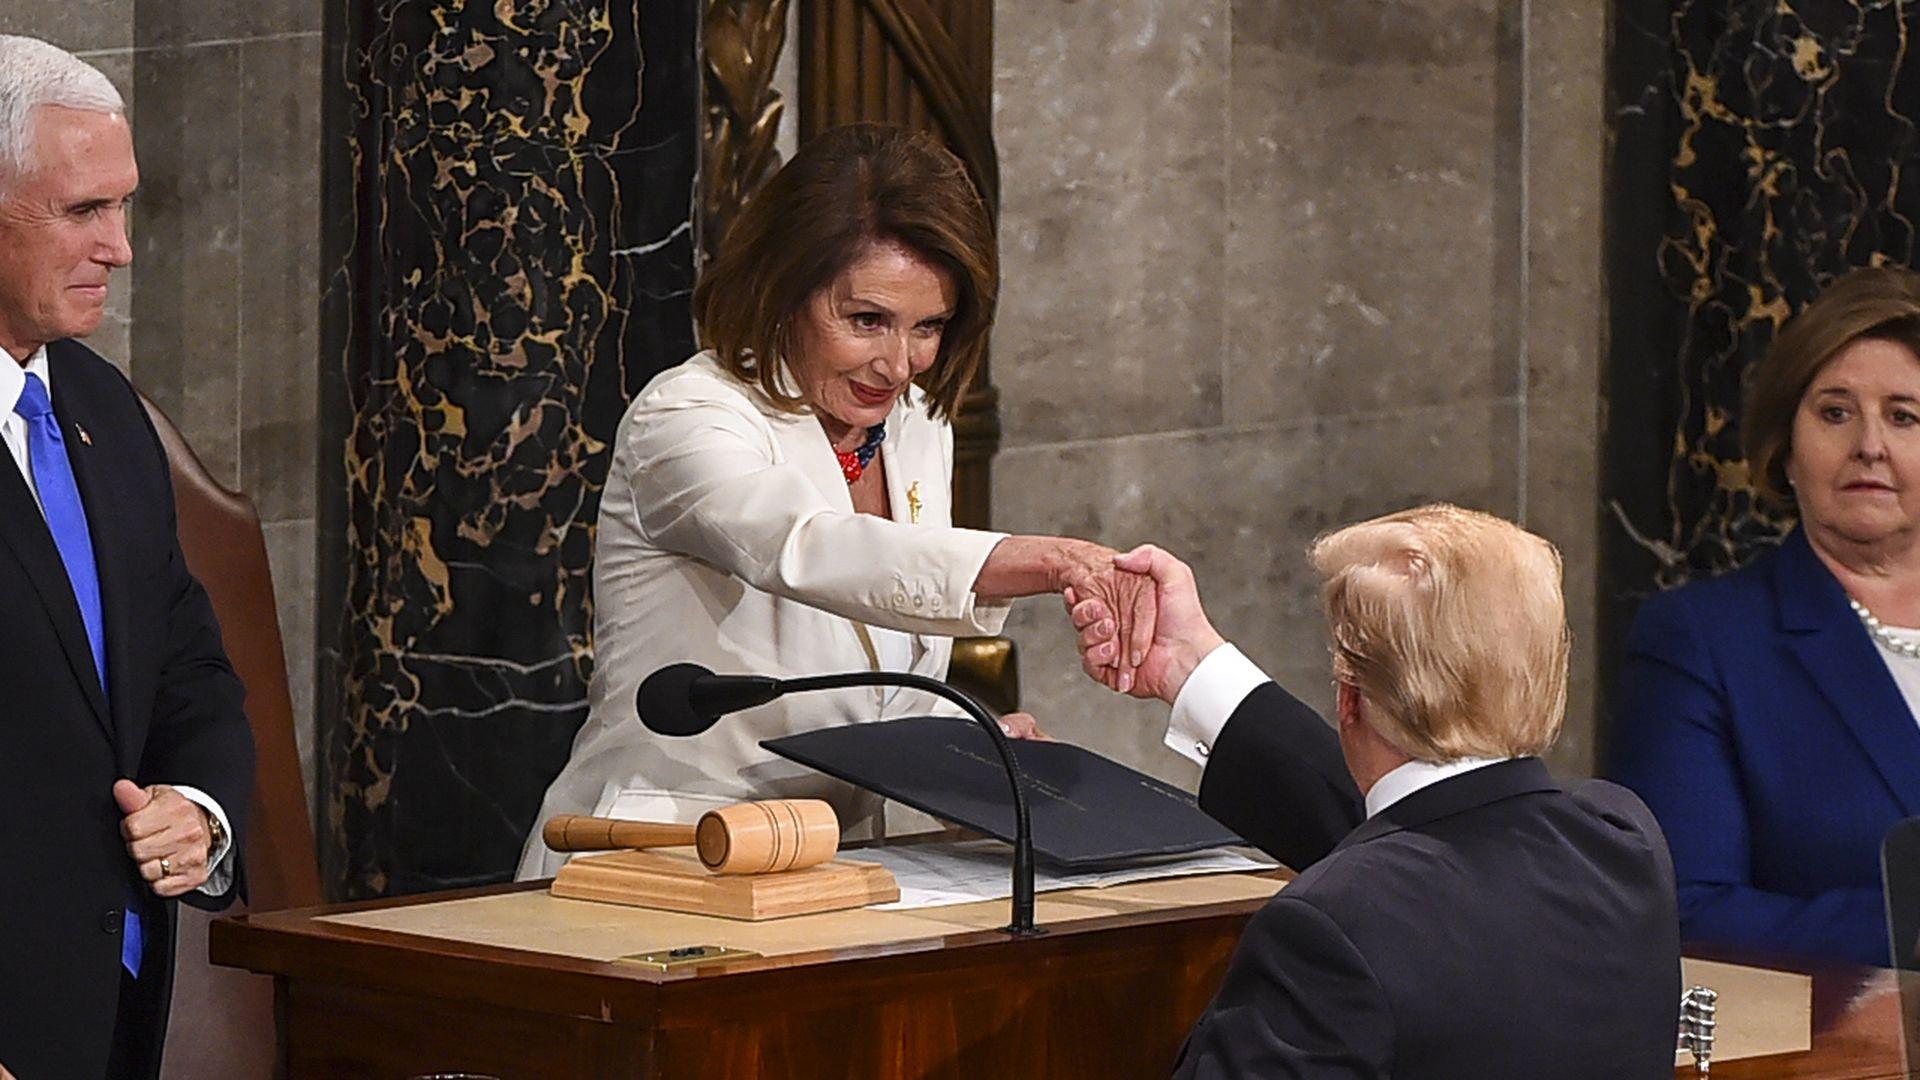 House Speaker Nancy Pelosi and President Trump shake hands.